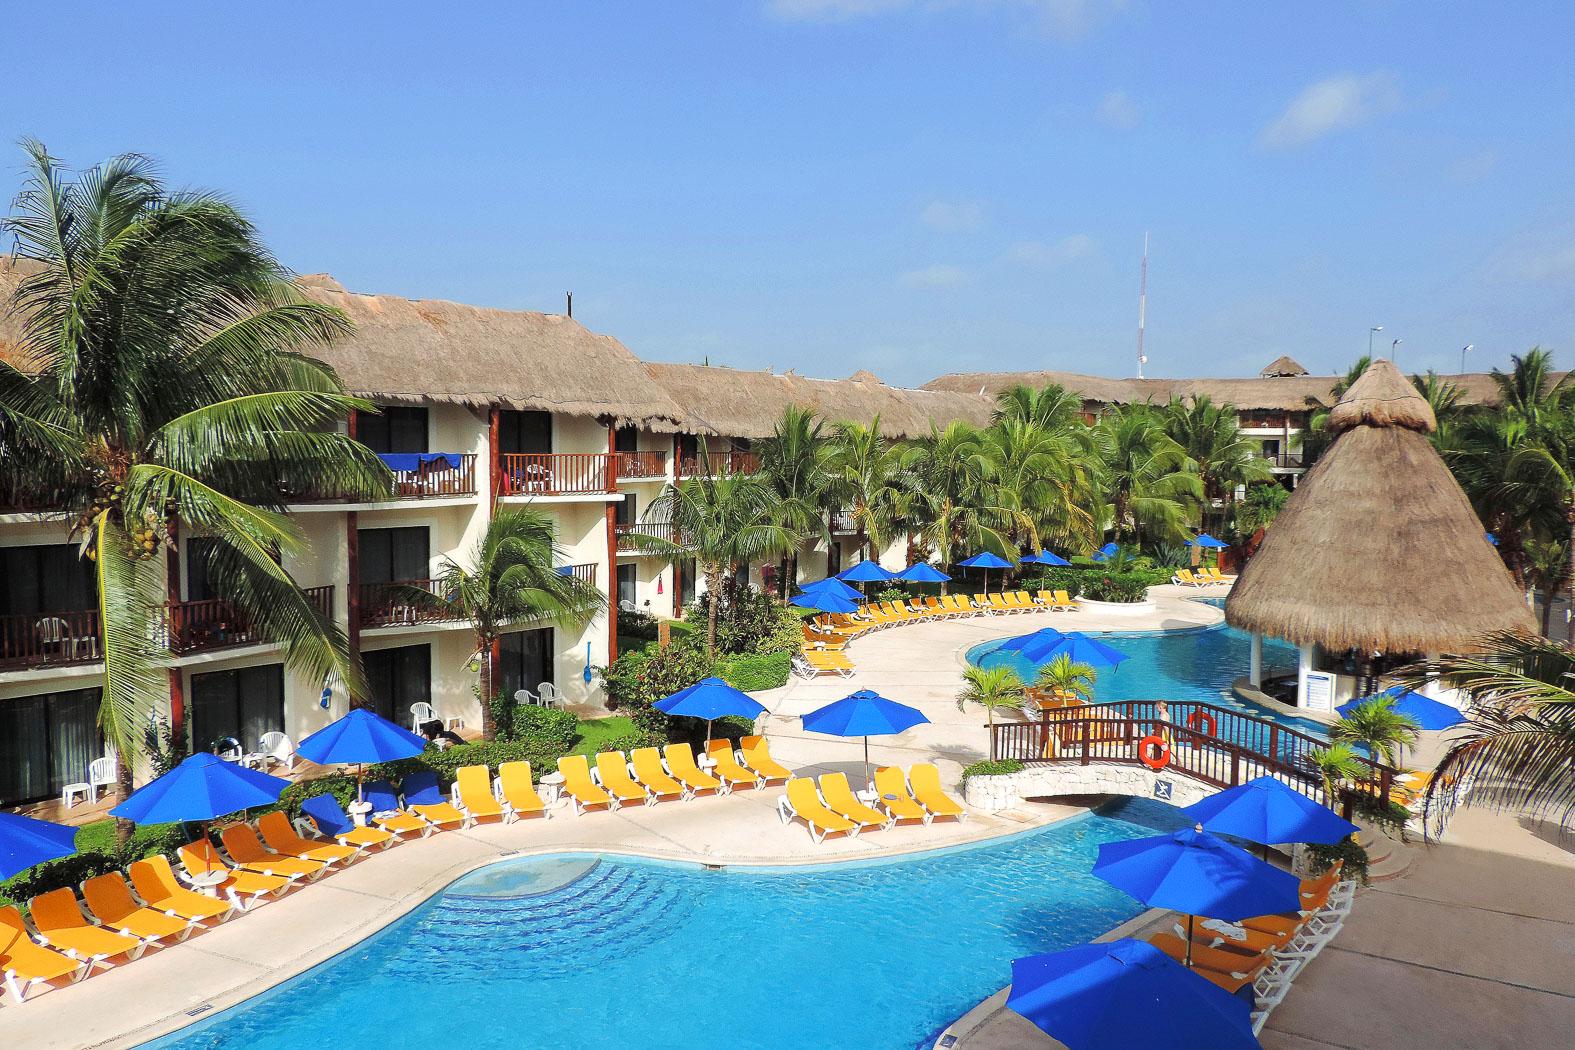 The Reef Coco Beach Resort Playa Del